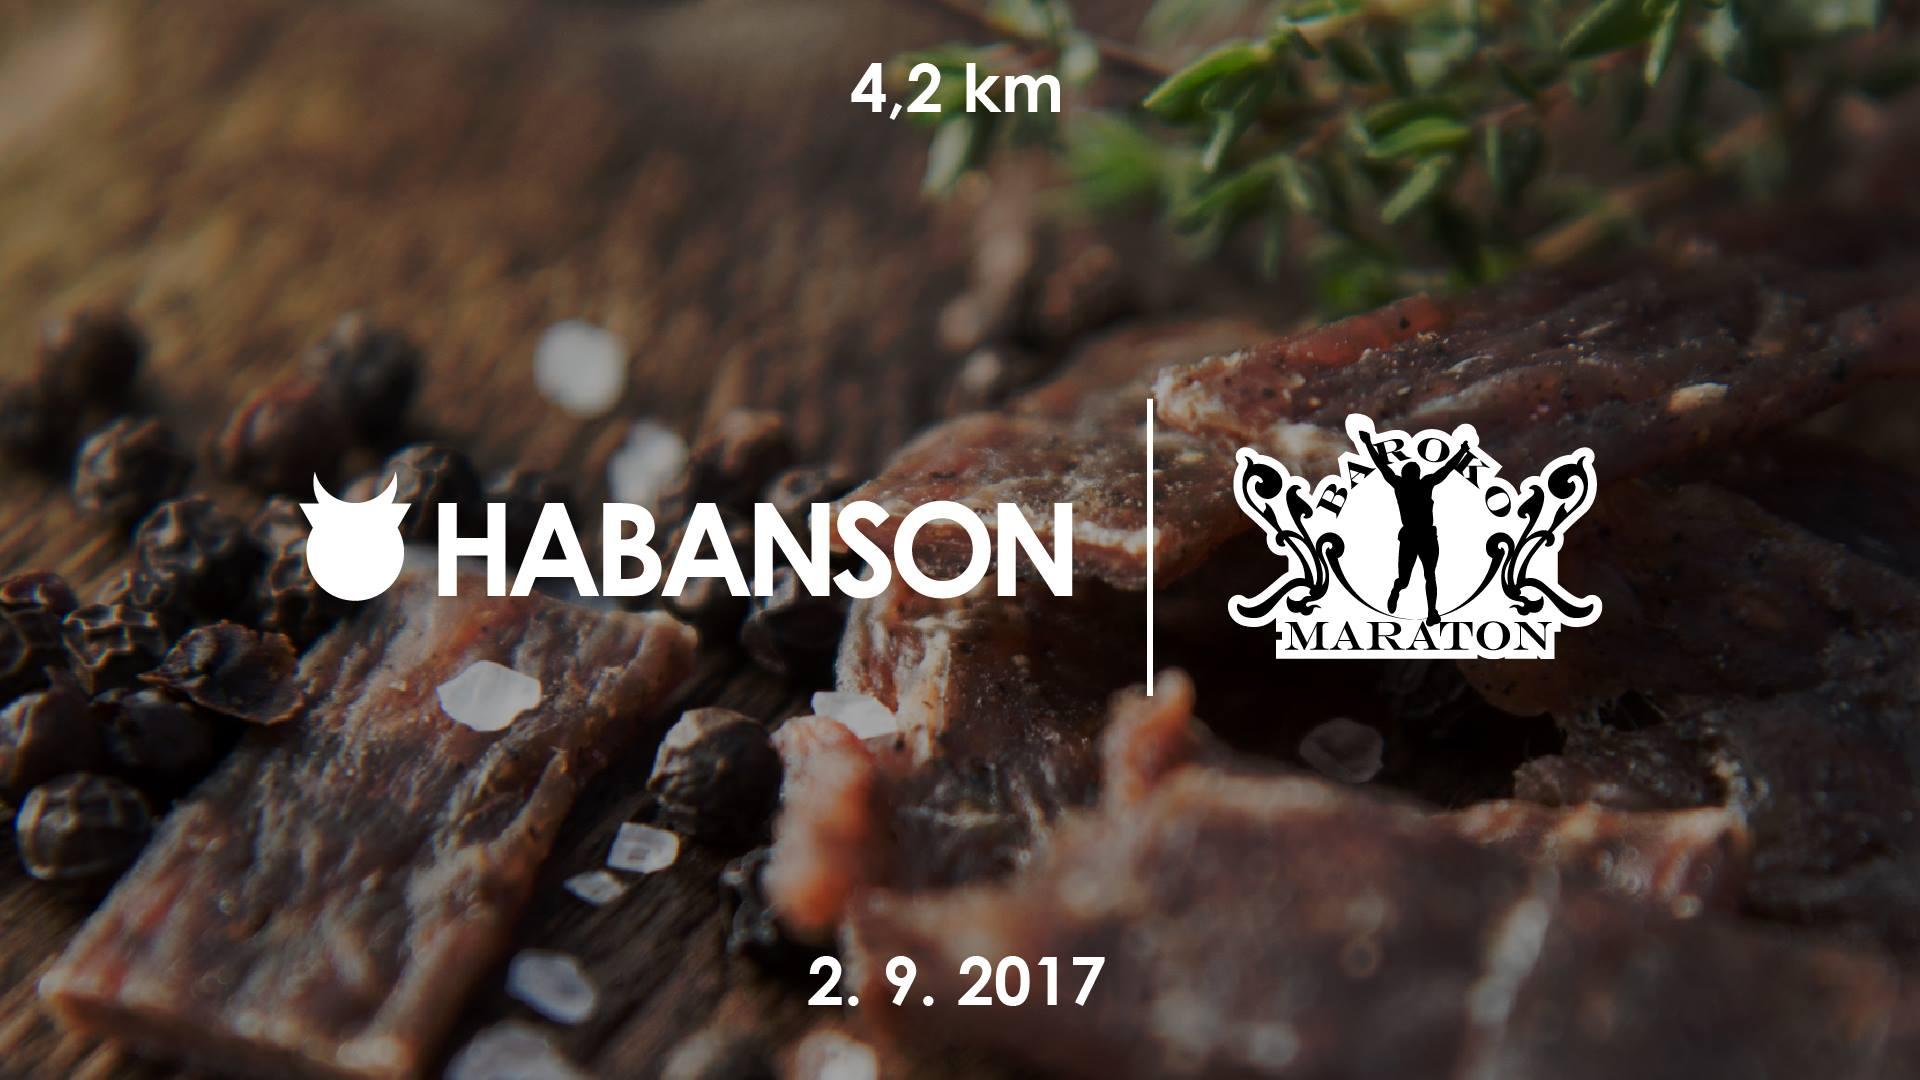 Baroko Habanson 4.2 km 2017